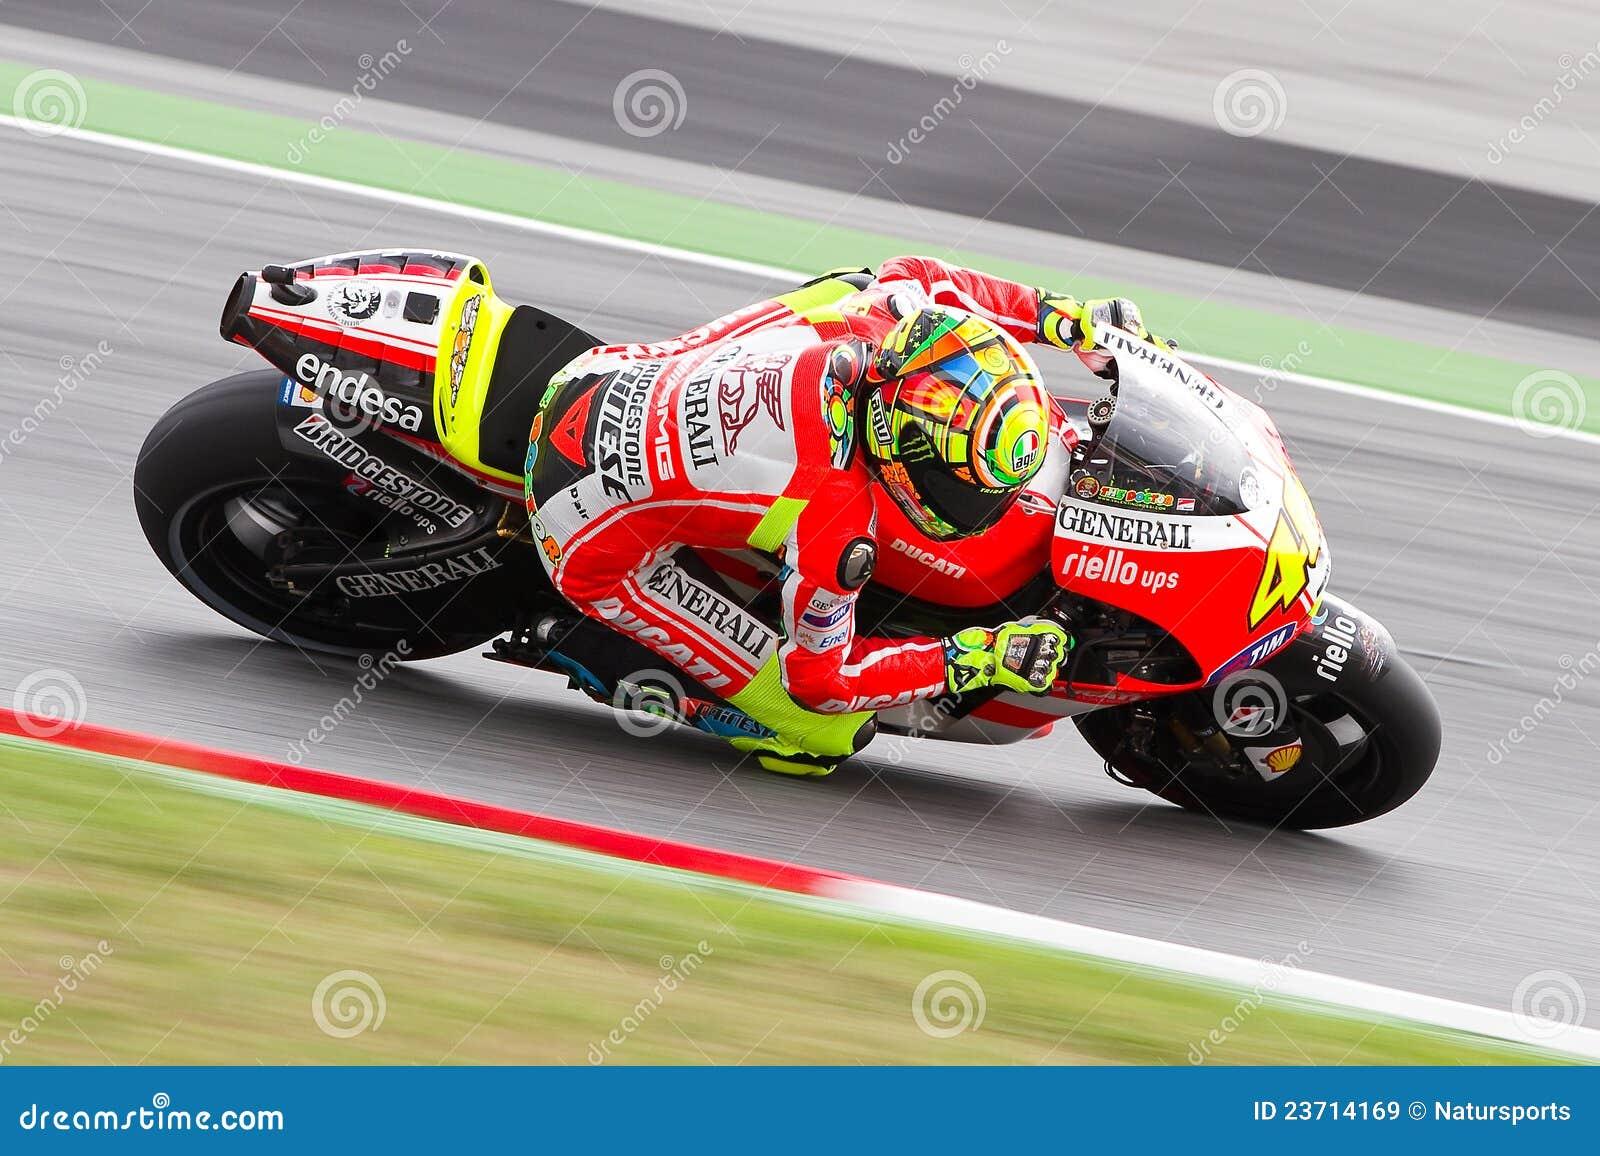 Valentino Rossi Editorial Stock Image - Image: 23714169